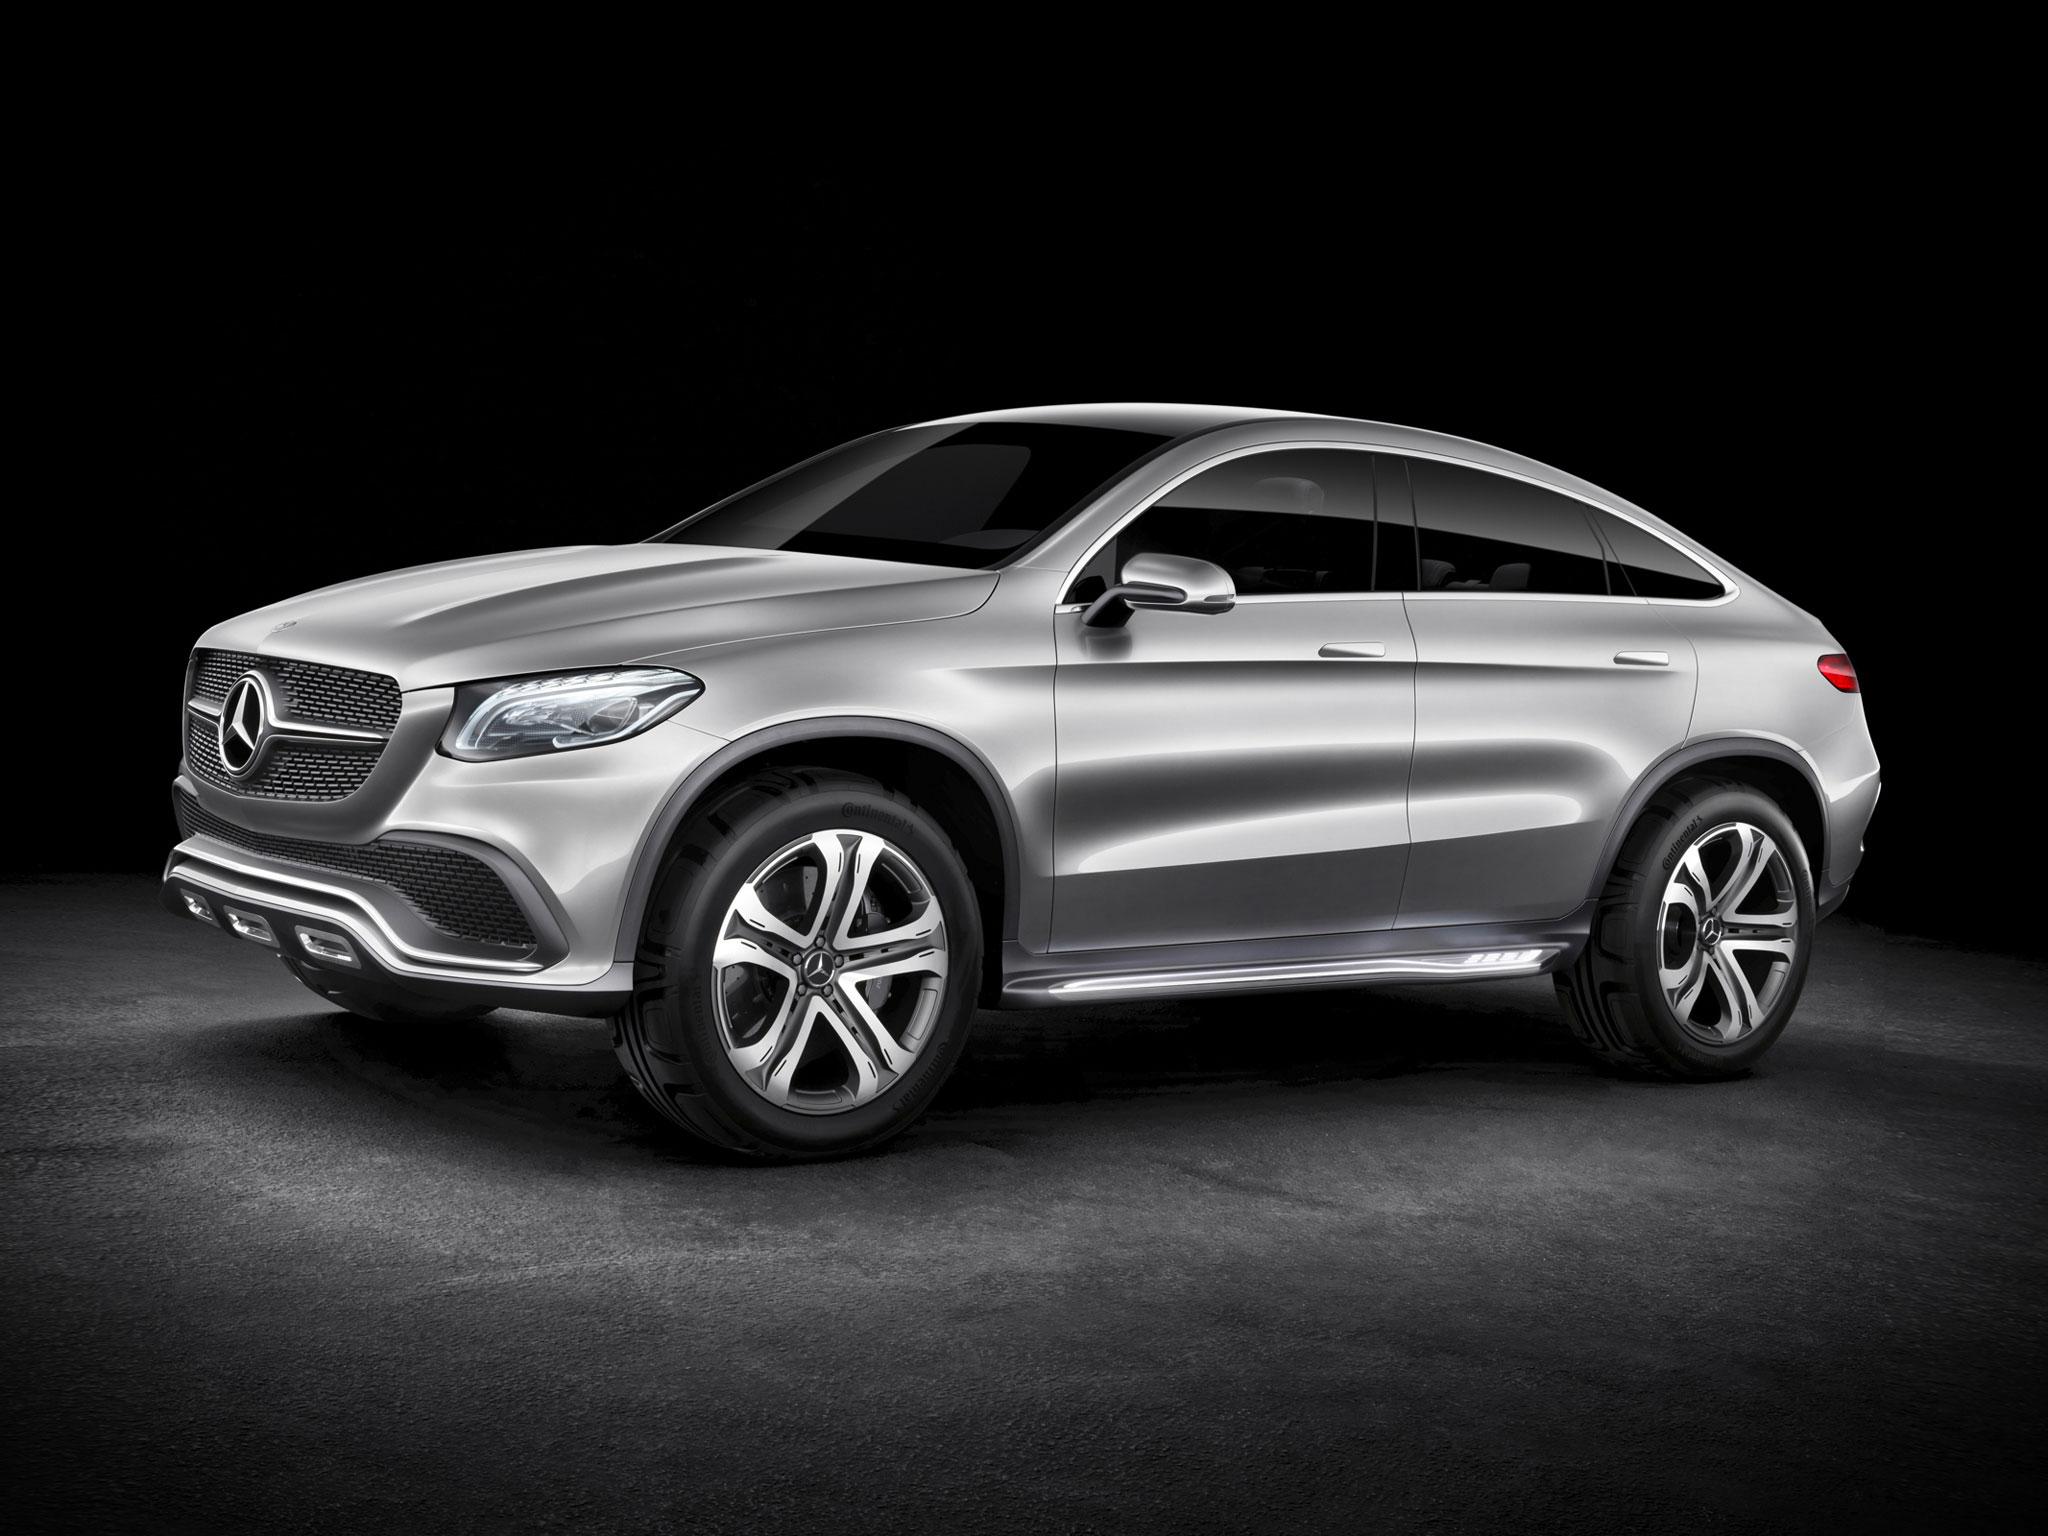 Mercedes New Cars Hd Wallpapers صور سيارات مرسيدس خلفيات ورمزيات 2016 سوبر كايرو